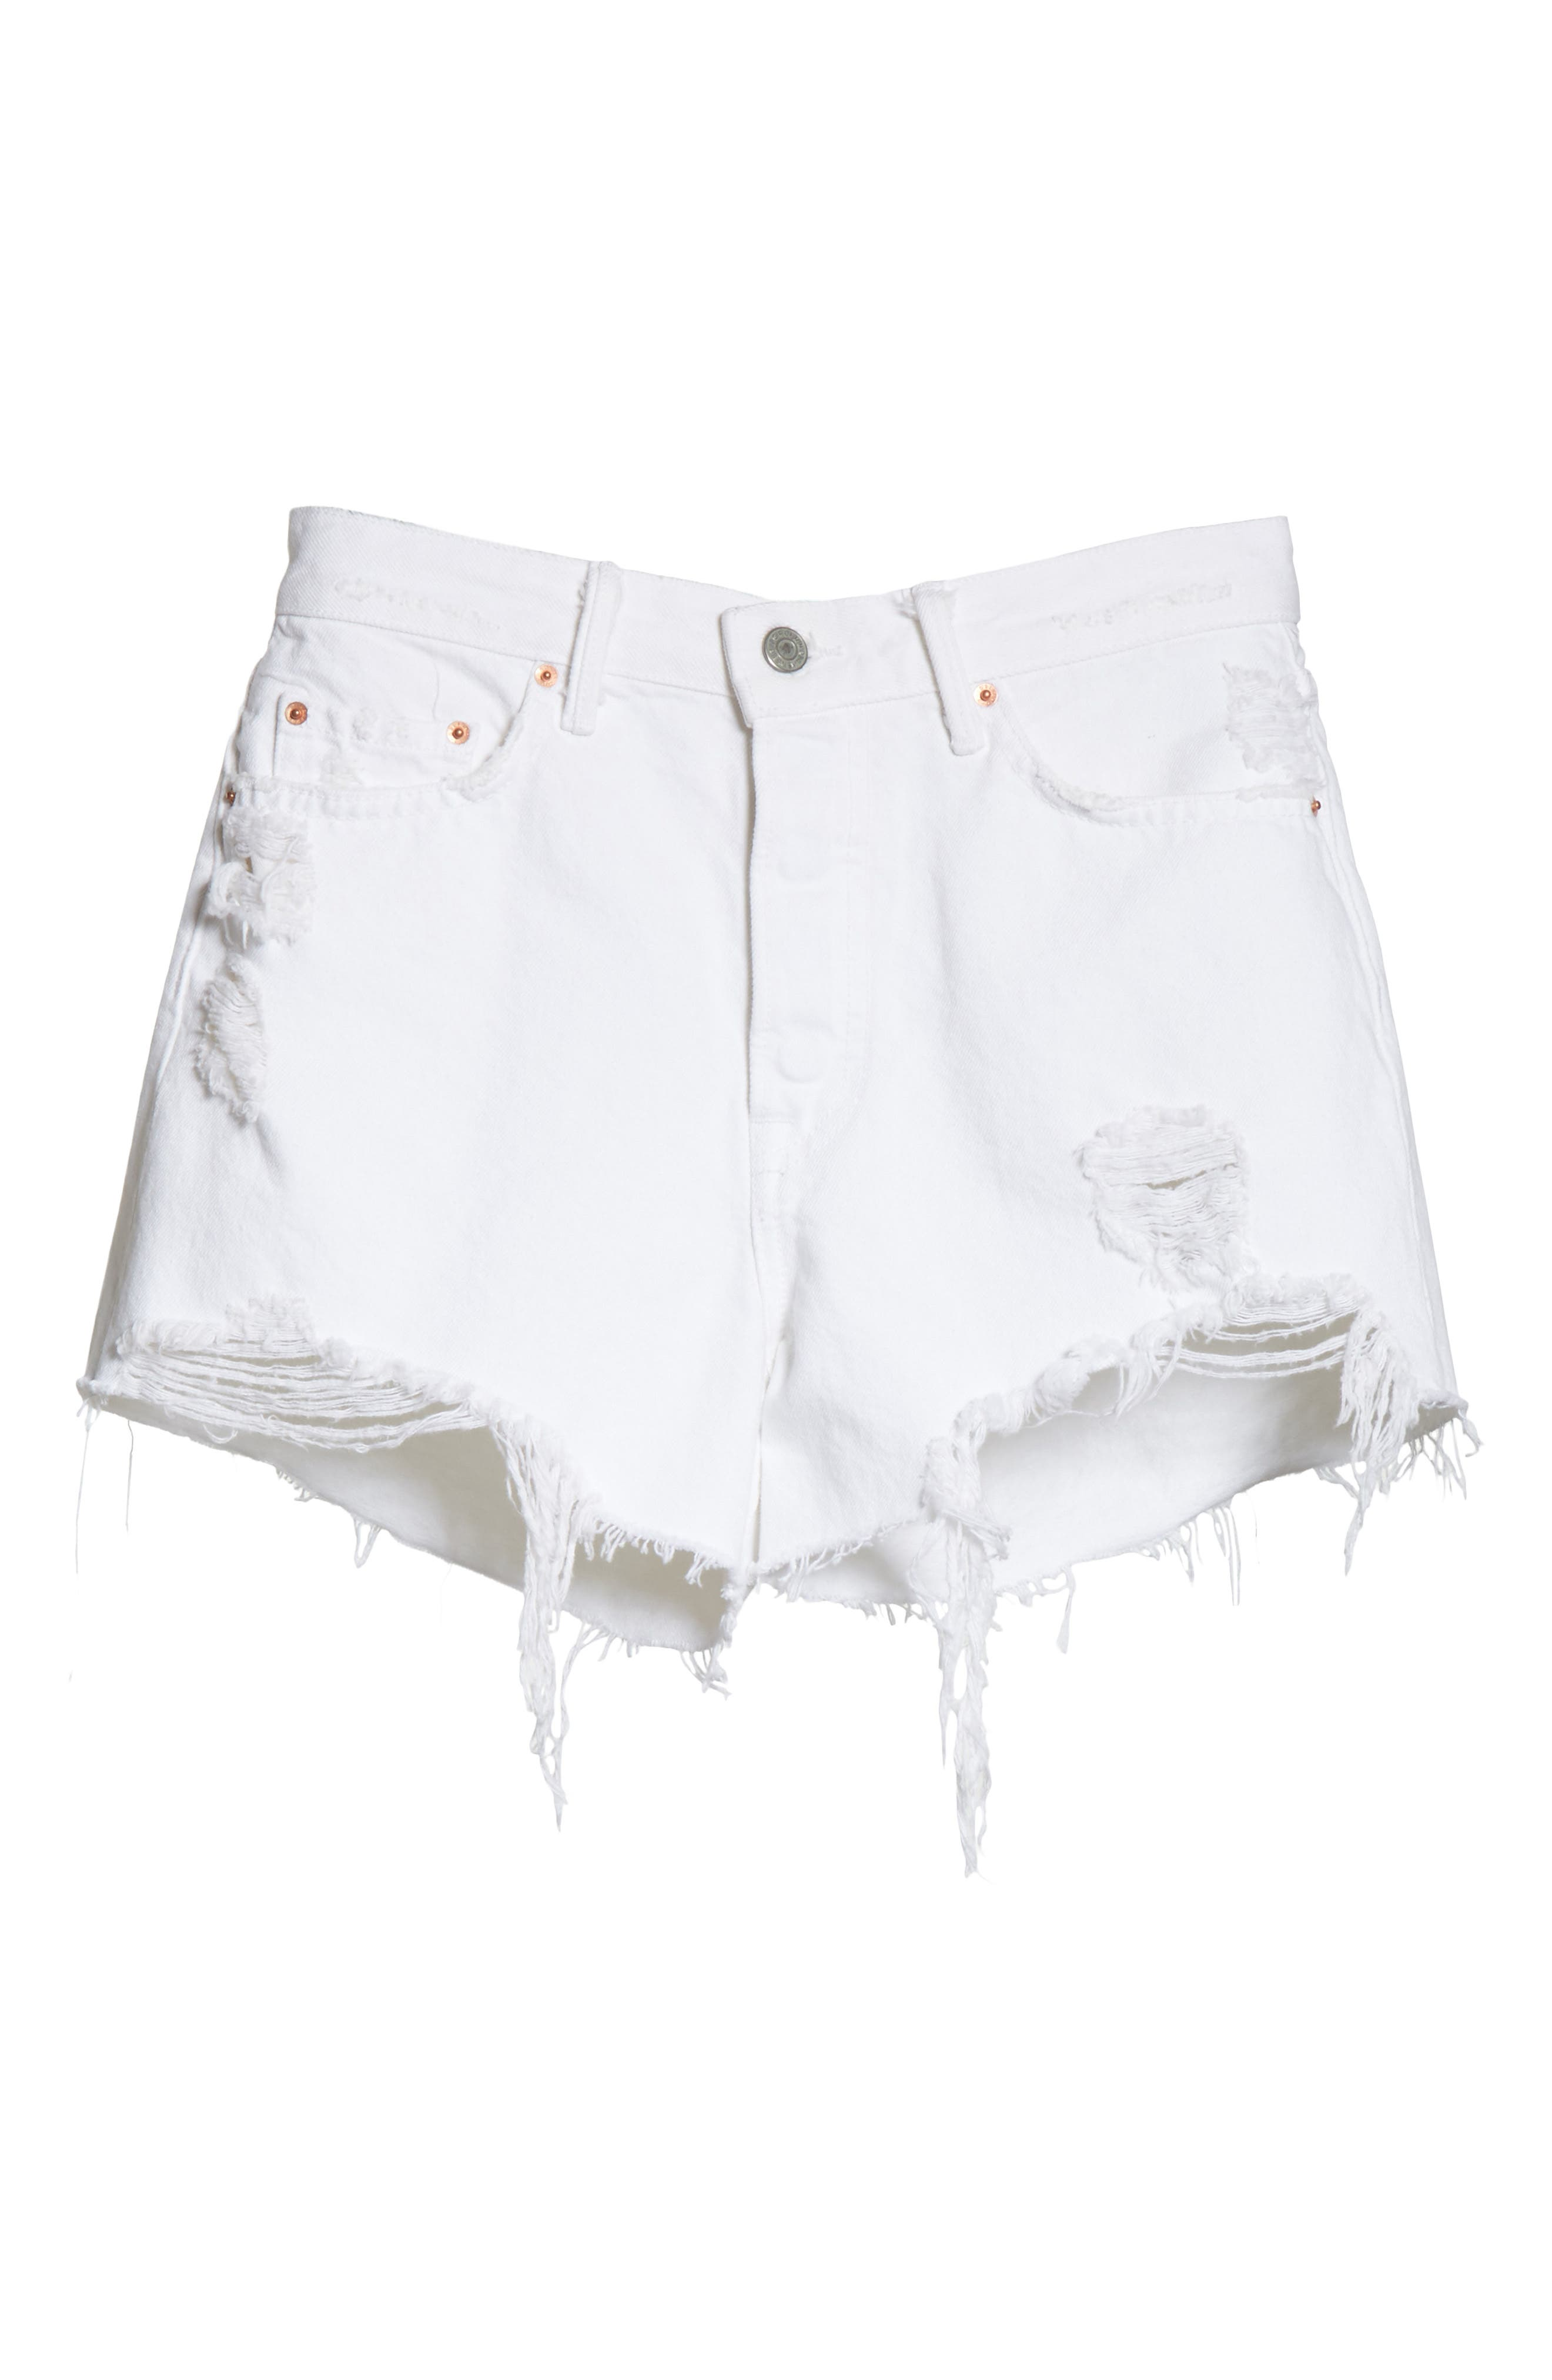 Helena High Waist Denim Shorts,                             Alternate thumbnail 7, color,                             100